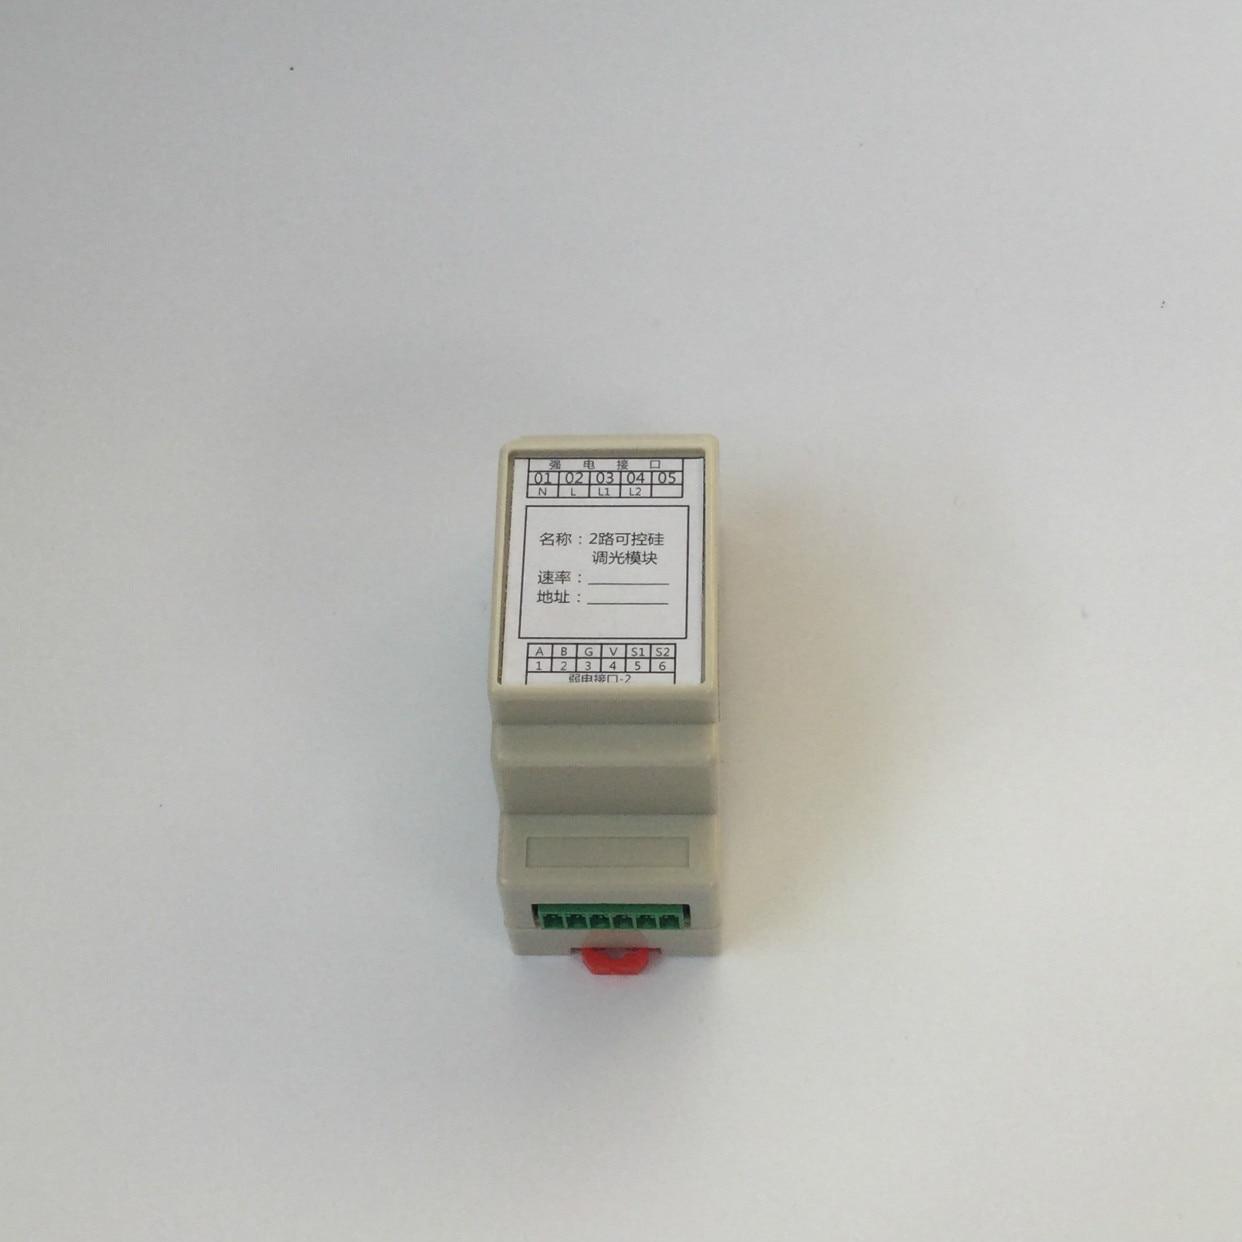 2 Way Thyristor Dimming Module RS485, Modbus, HD0742 t50ac120a 50a1200v thyristor module